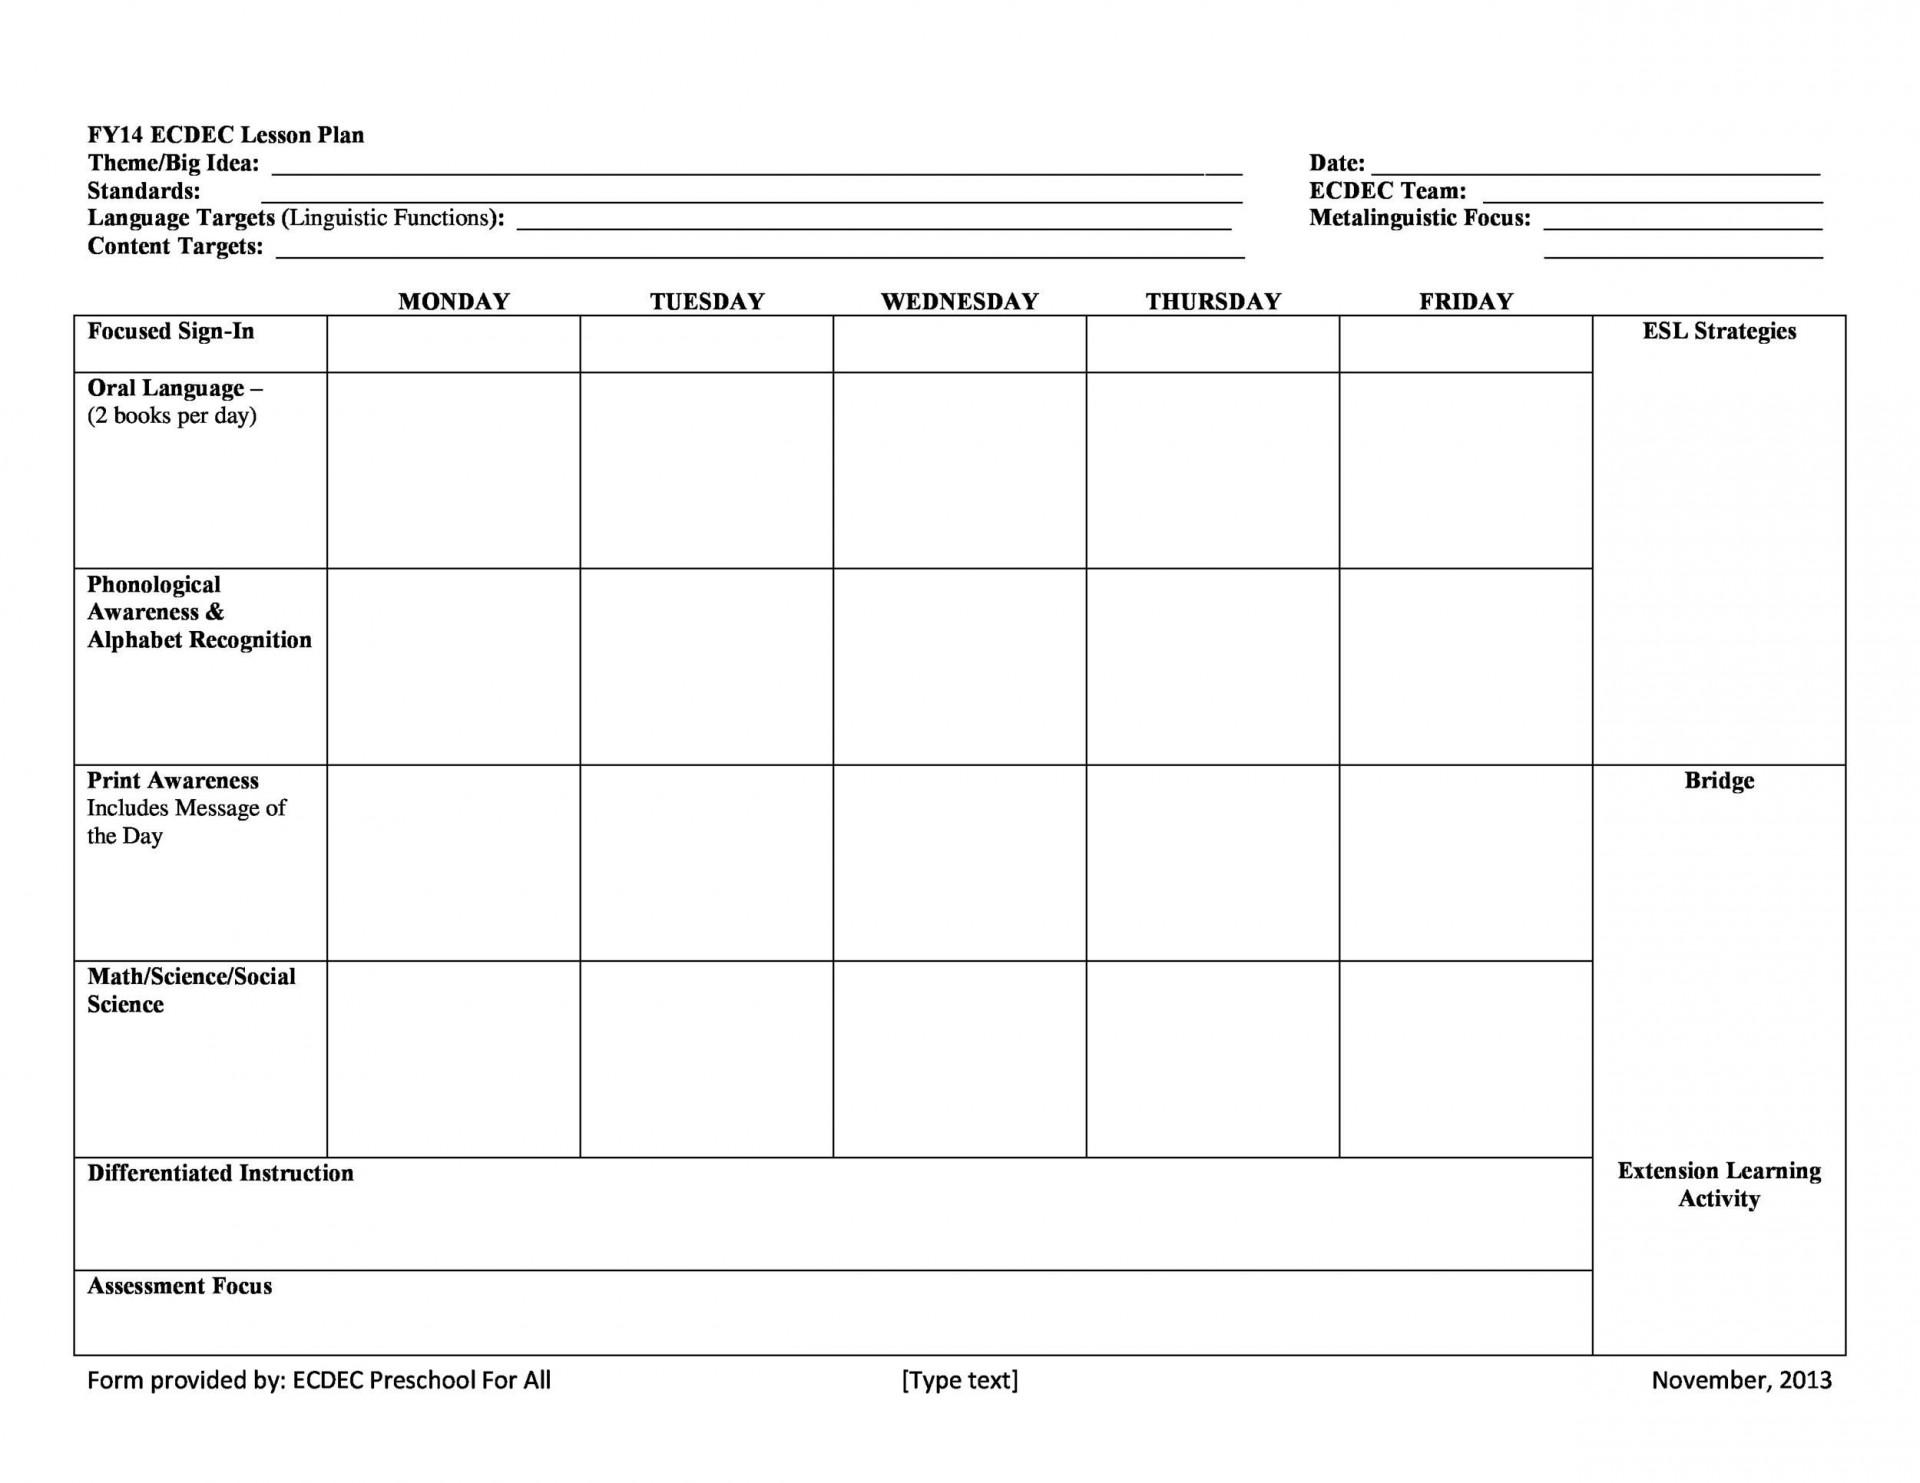 004 Amazing Preschool Weekly Lesson Plan Template High Definition  Editable Pdf Word1920